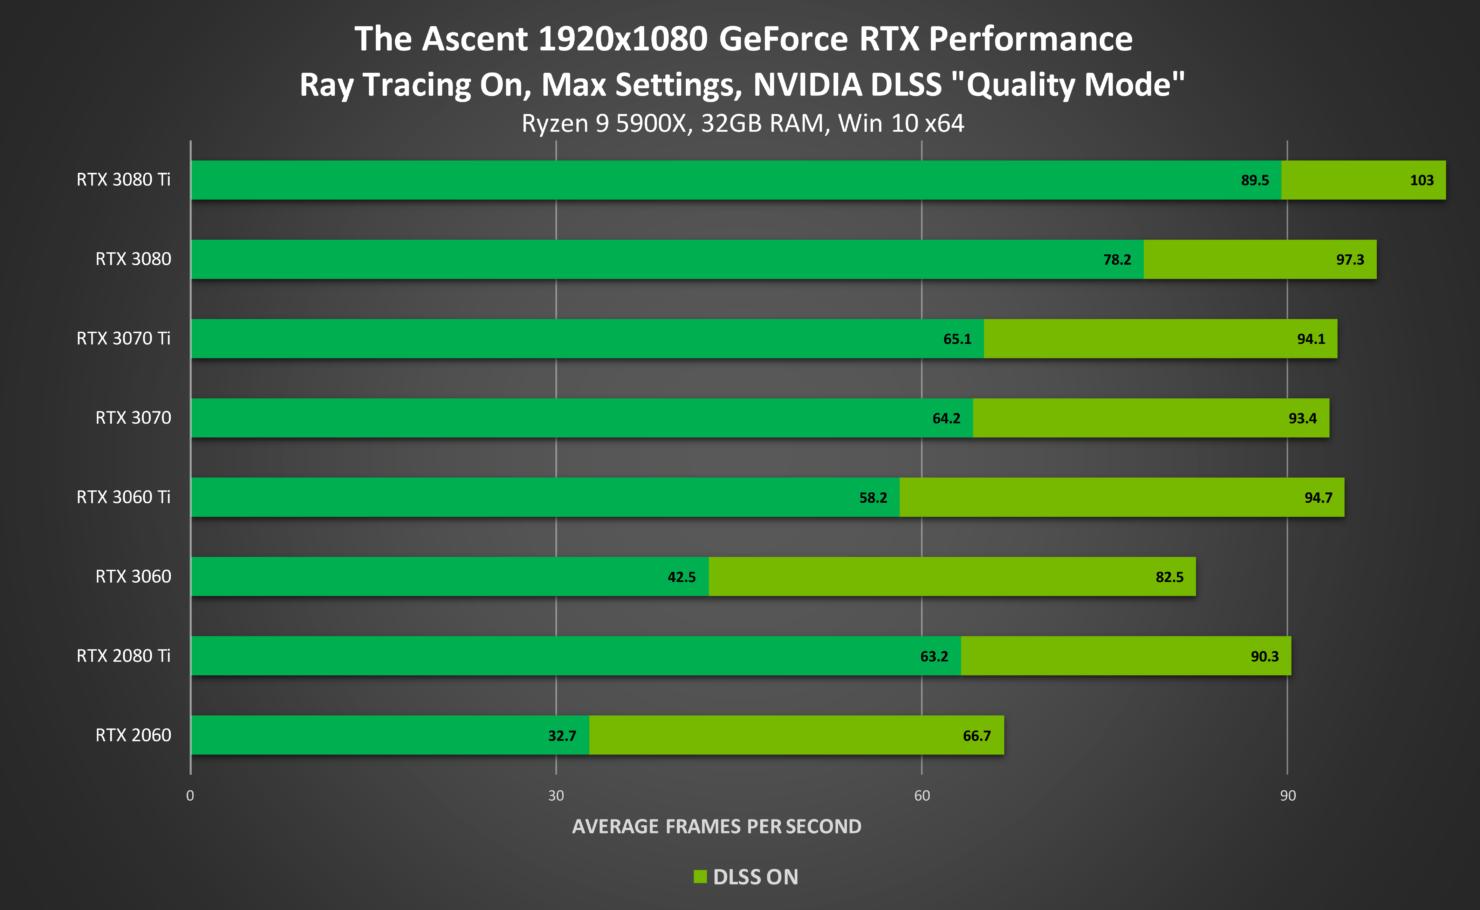 the-ascent-geforce-rtx-1920x1080-ray-tracing-on-nvidia-dlss-desktop-gpu-performance